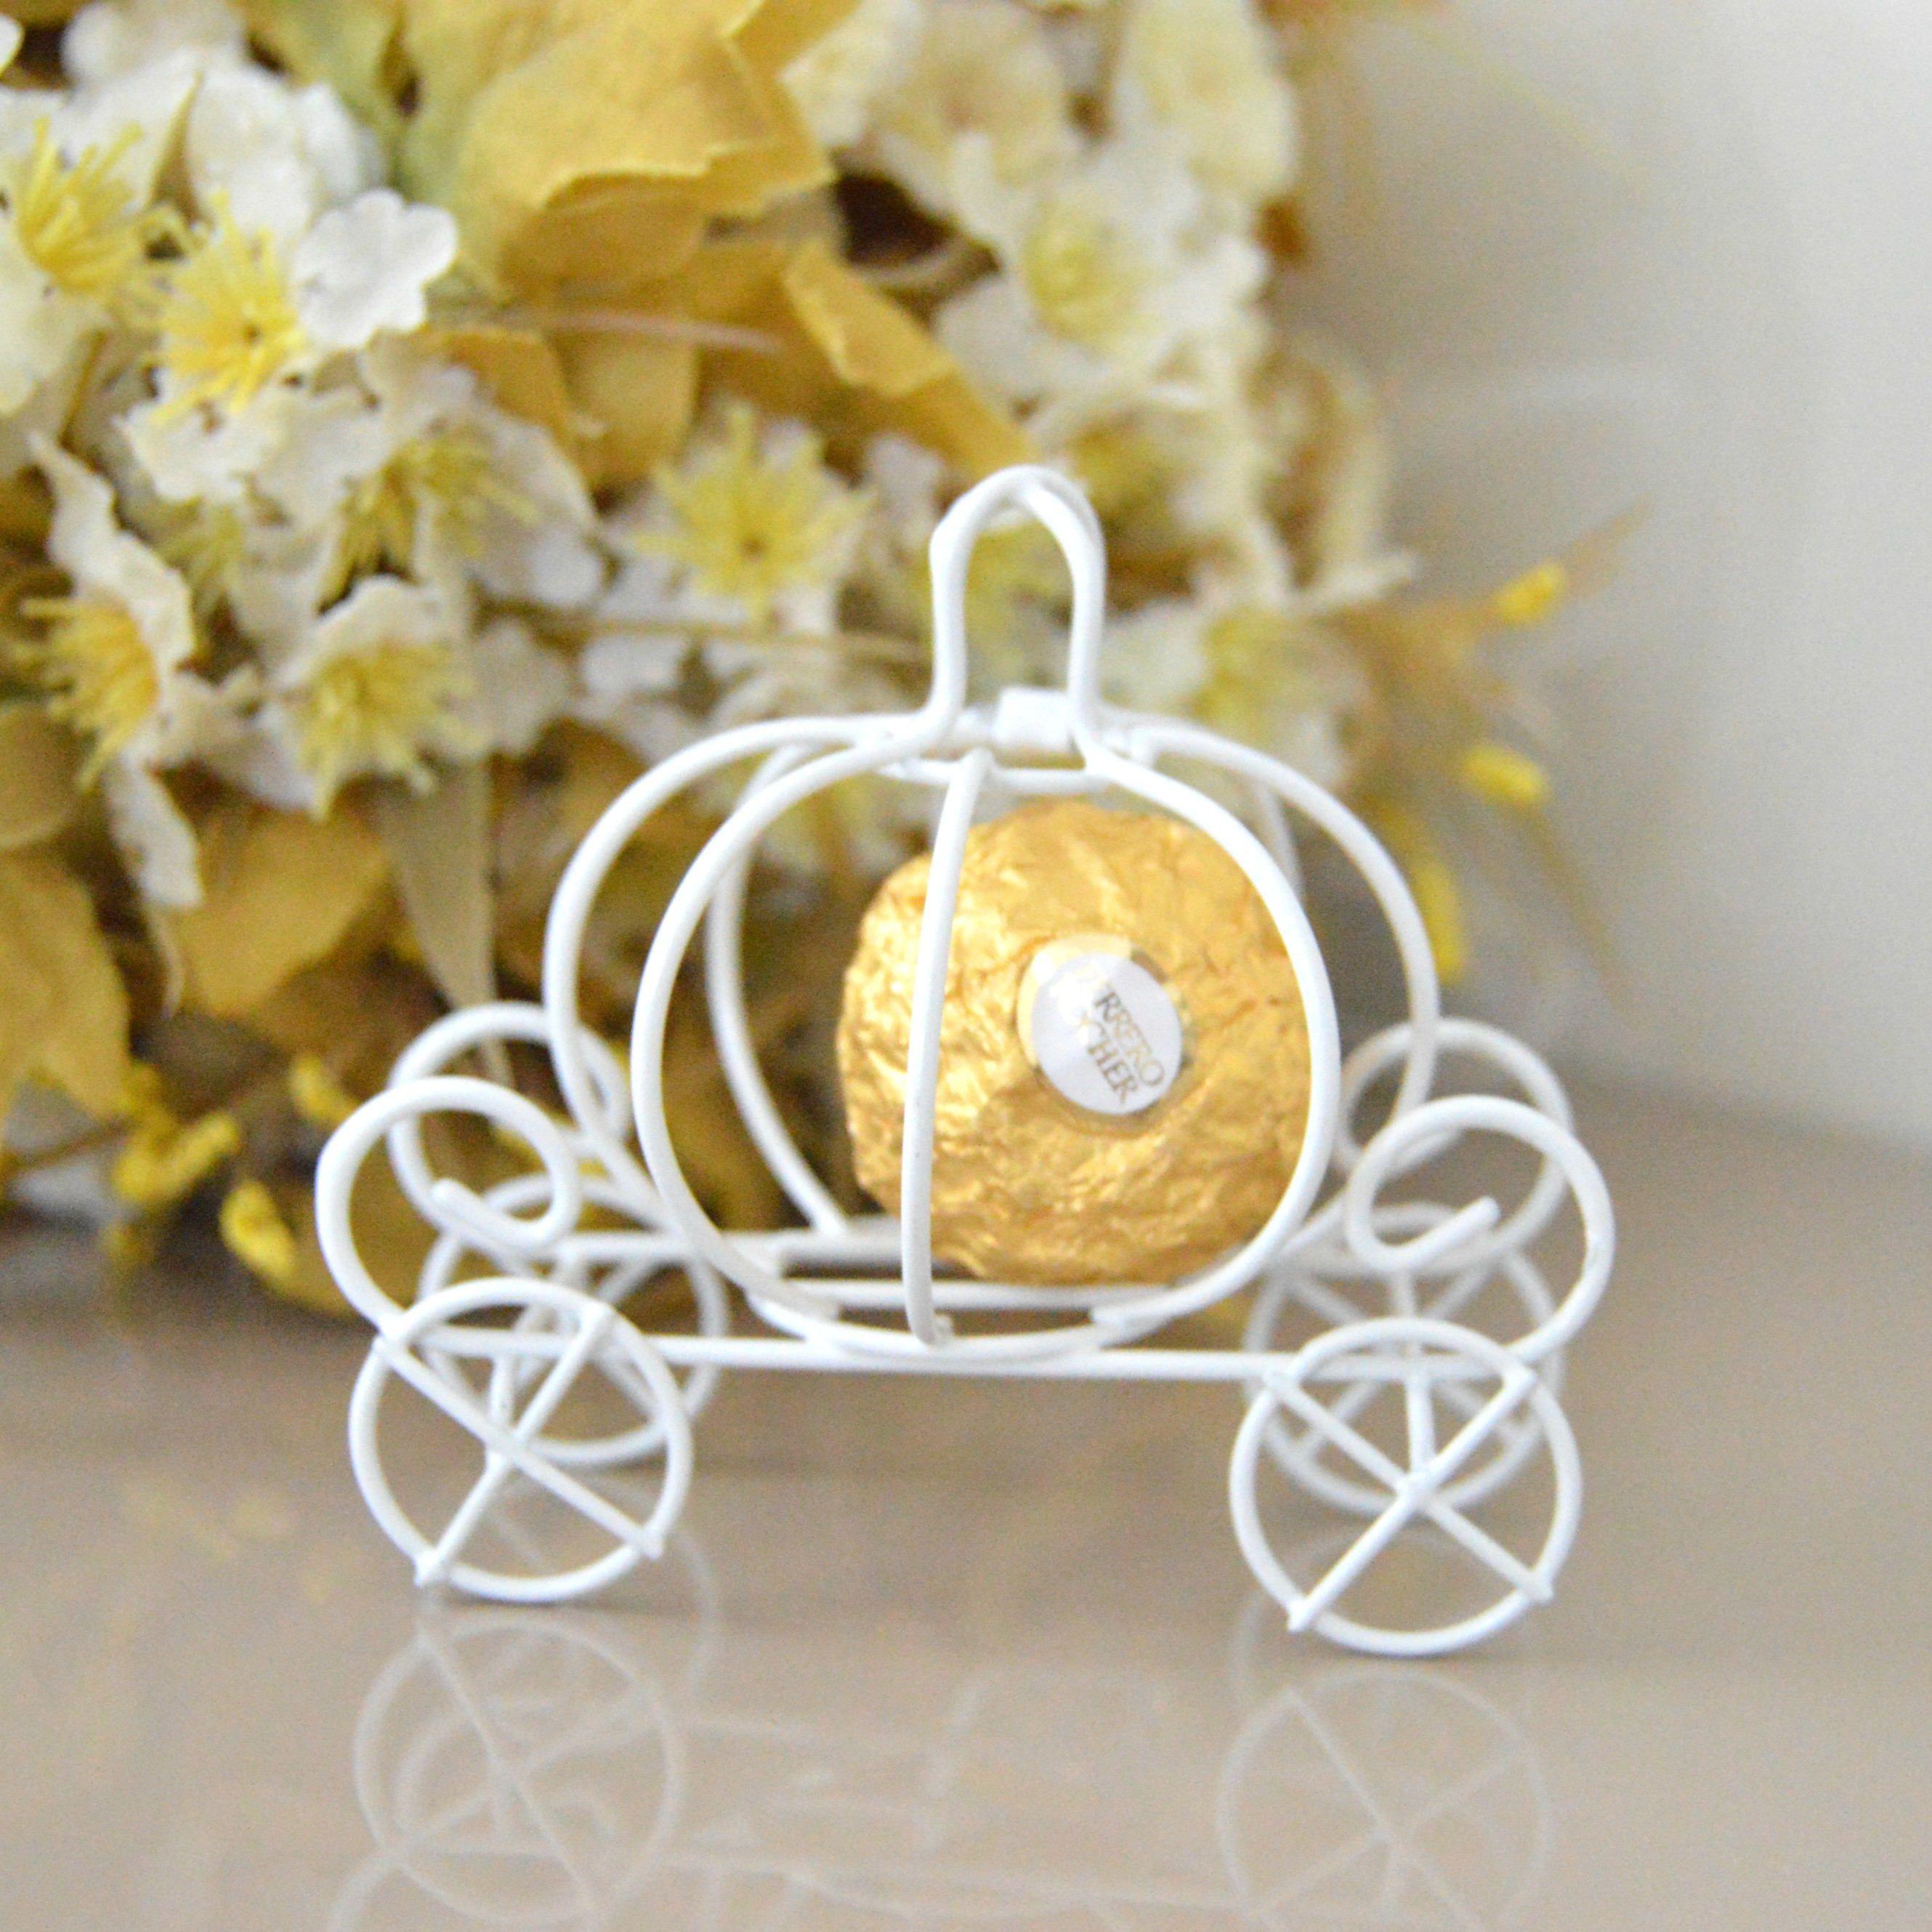 Cinderella Pumpkin Carriage Wedding Favor Box Idea Pumpkin Wedding